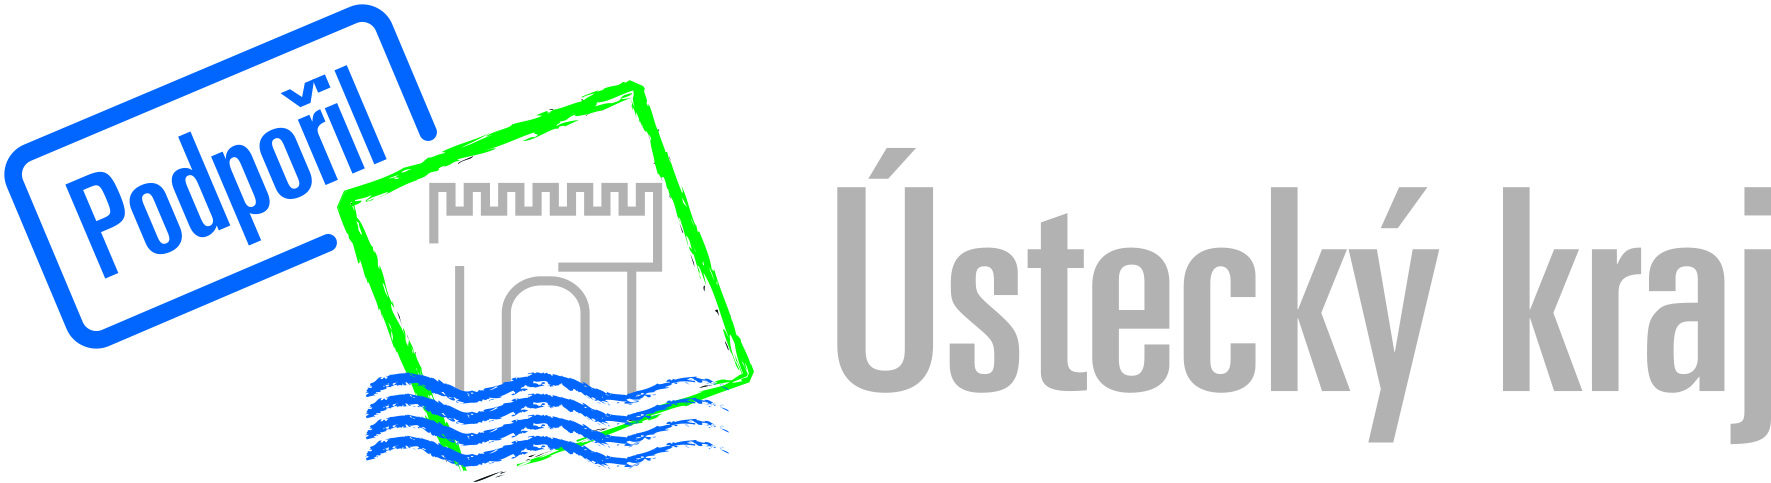 http://www.kr-ustecky.cz/VismoOnline_ActionScripts/File.ashx?id_org=450018&id_dokumenty=1687276